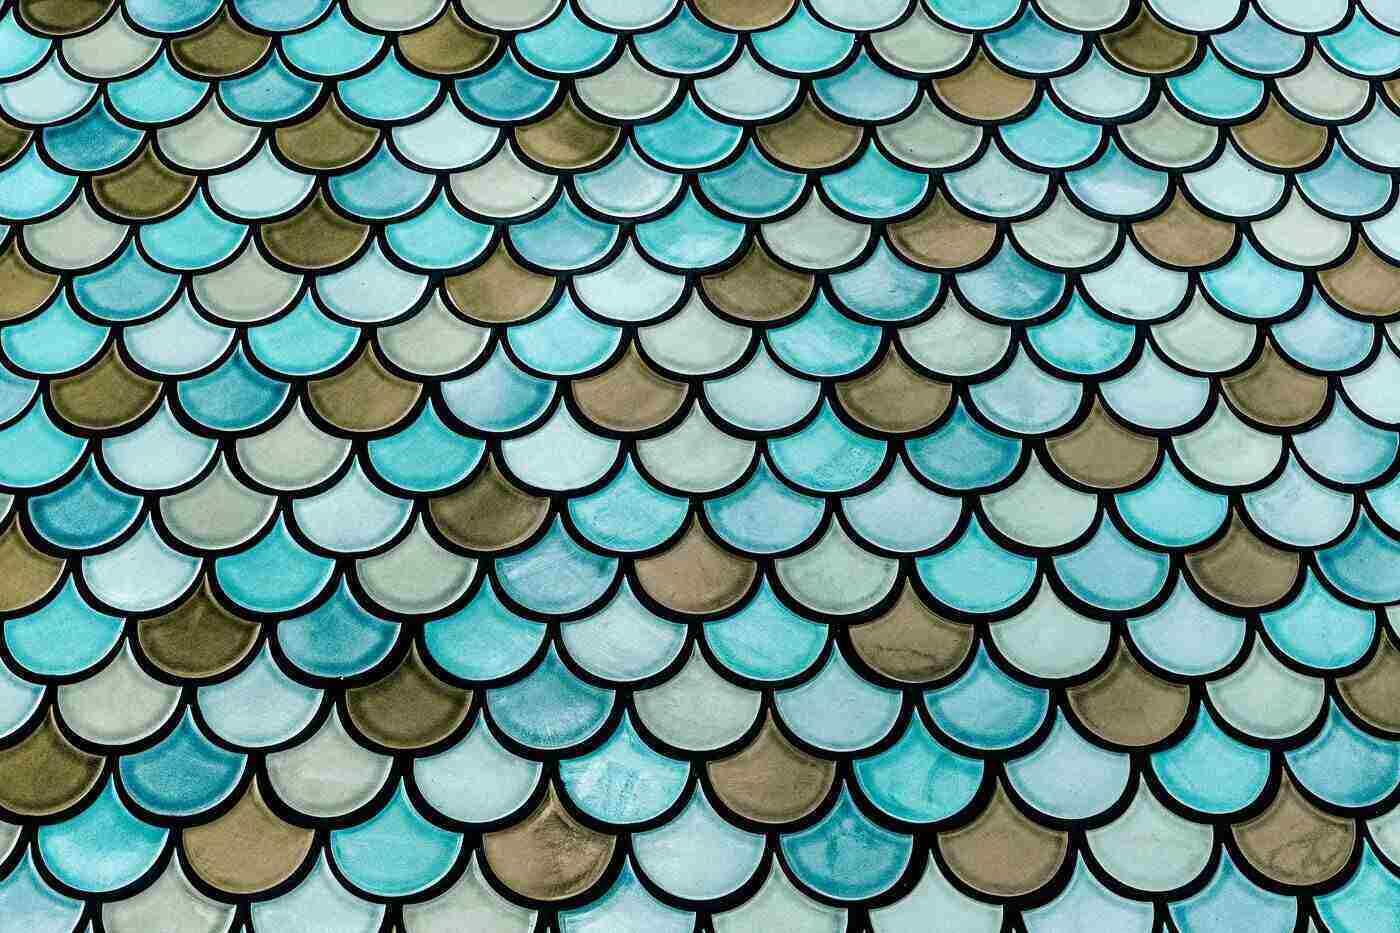 multi-coloured tiles - 4 ways to modernize your kitchen with eco-friendly tiling